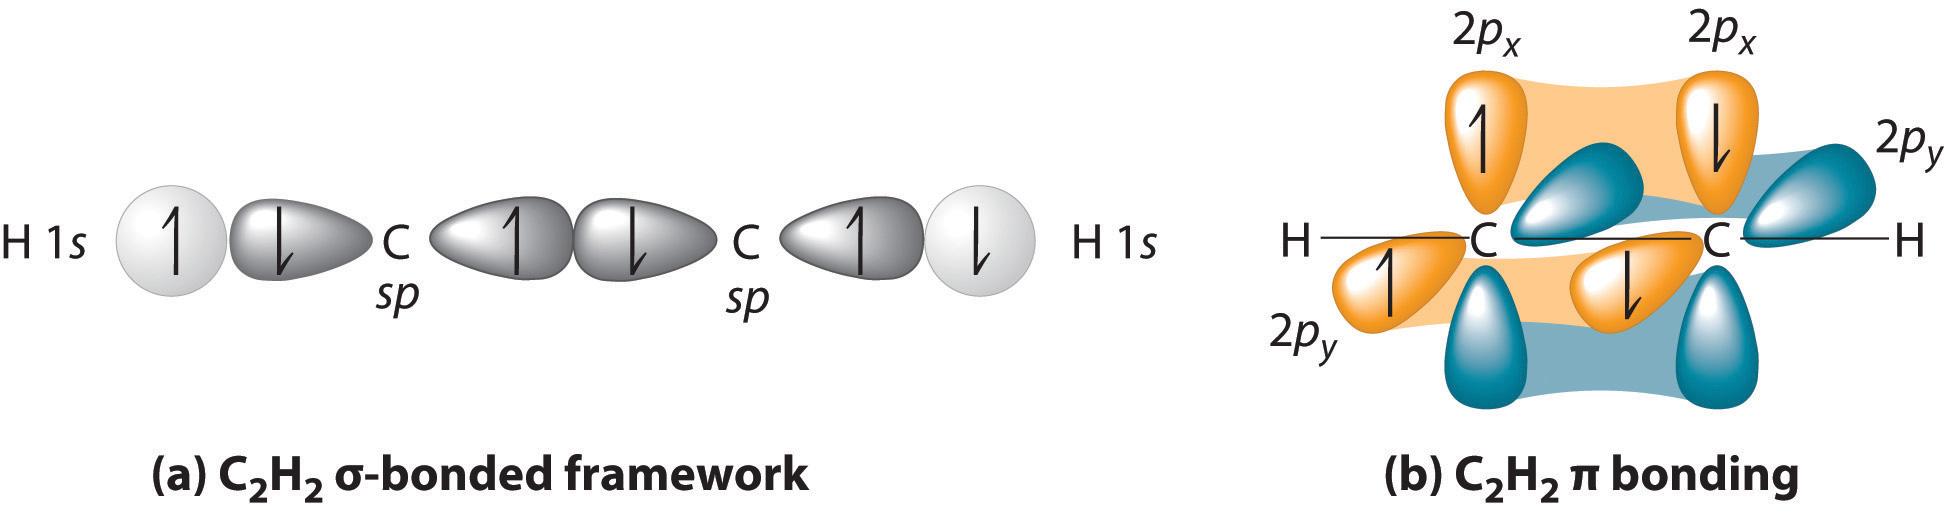 carbon carbon multiple bond Features of carbon  ability to form multiple bonds: carbon atom can form single,  double bond with oxygen, and triple bond with nitrogen.